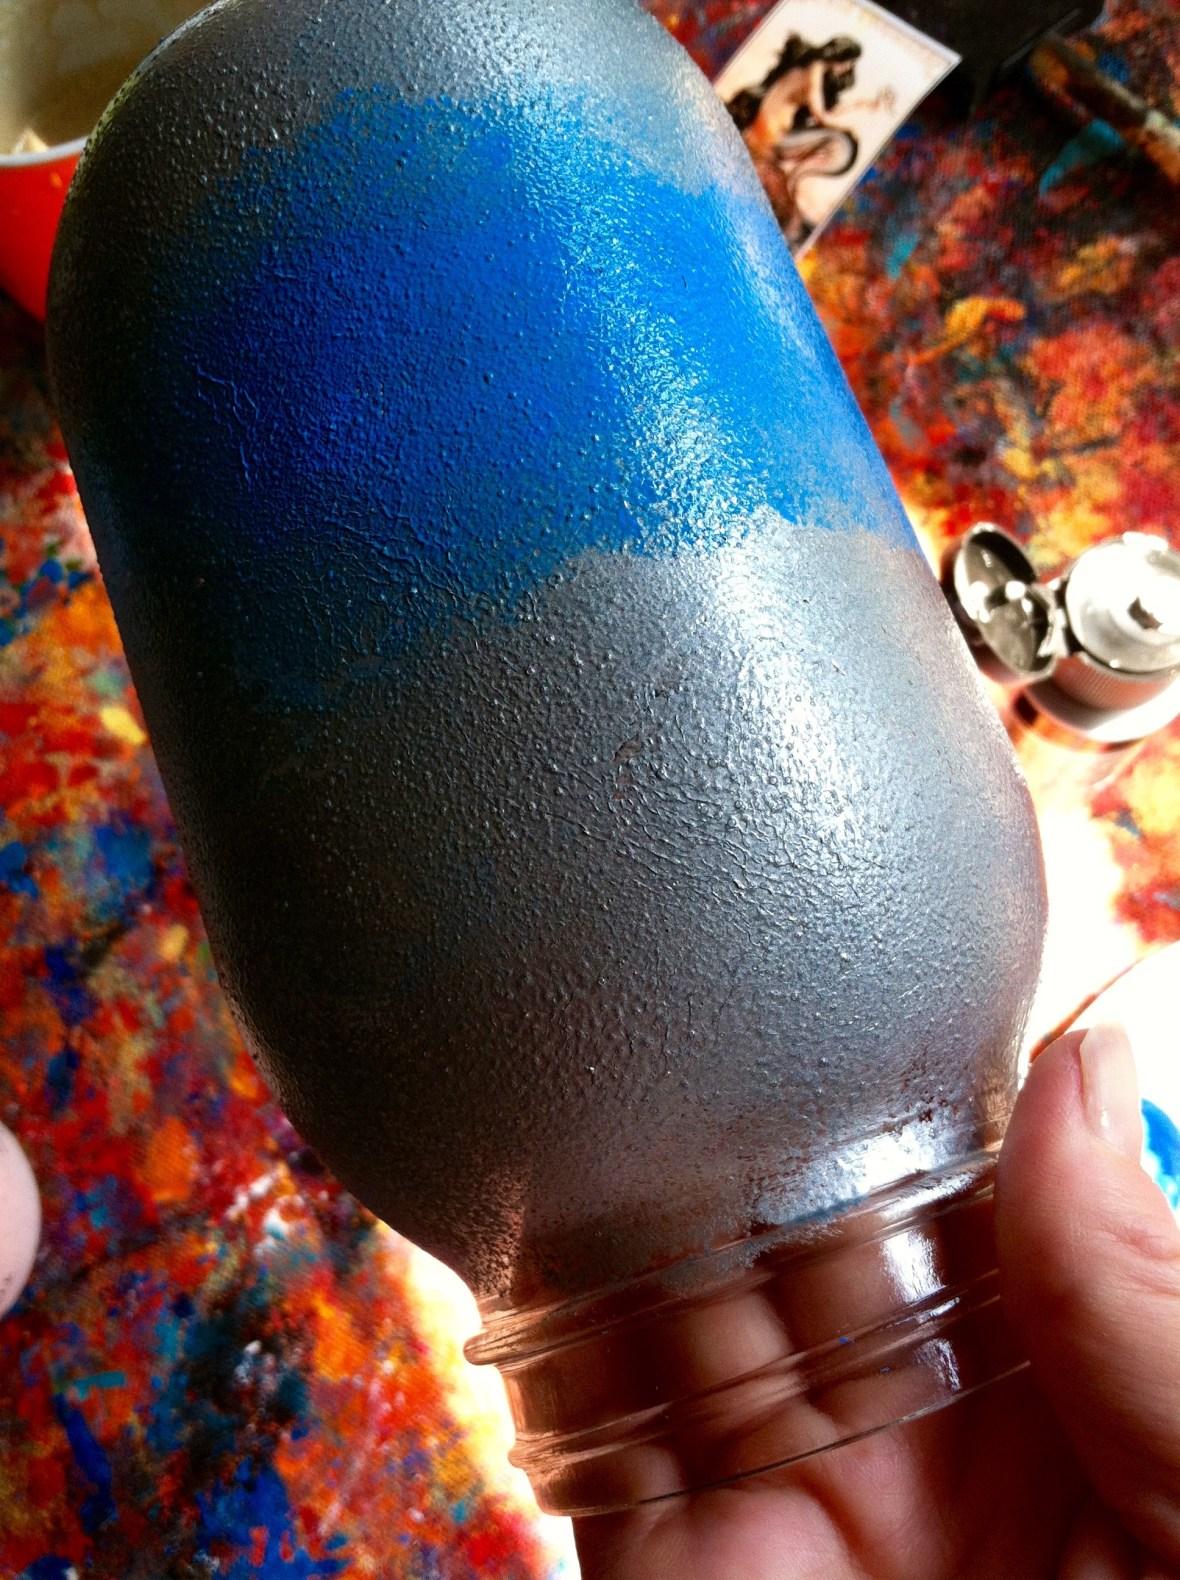 Painted jar upclose.